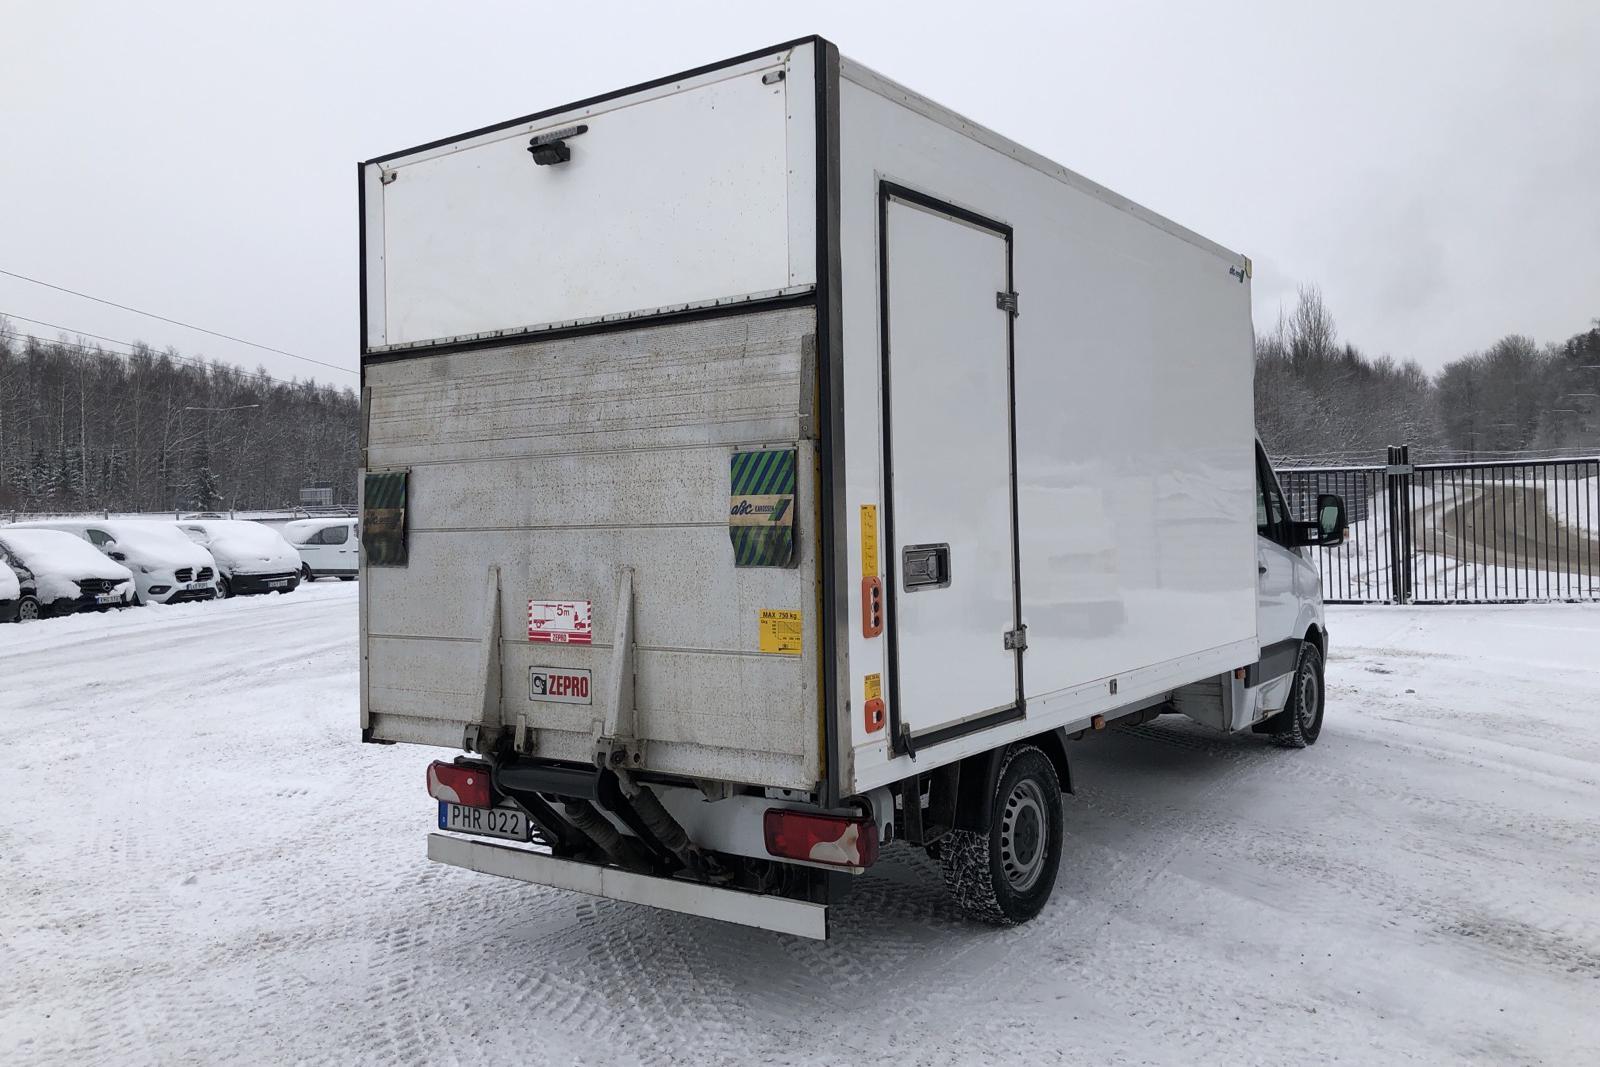 Mercedes Sprinter 316 CDI Volymskåp (163hk) - 156 010 km - Automatic - white - 2017